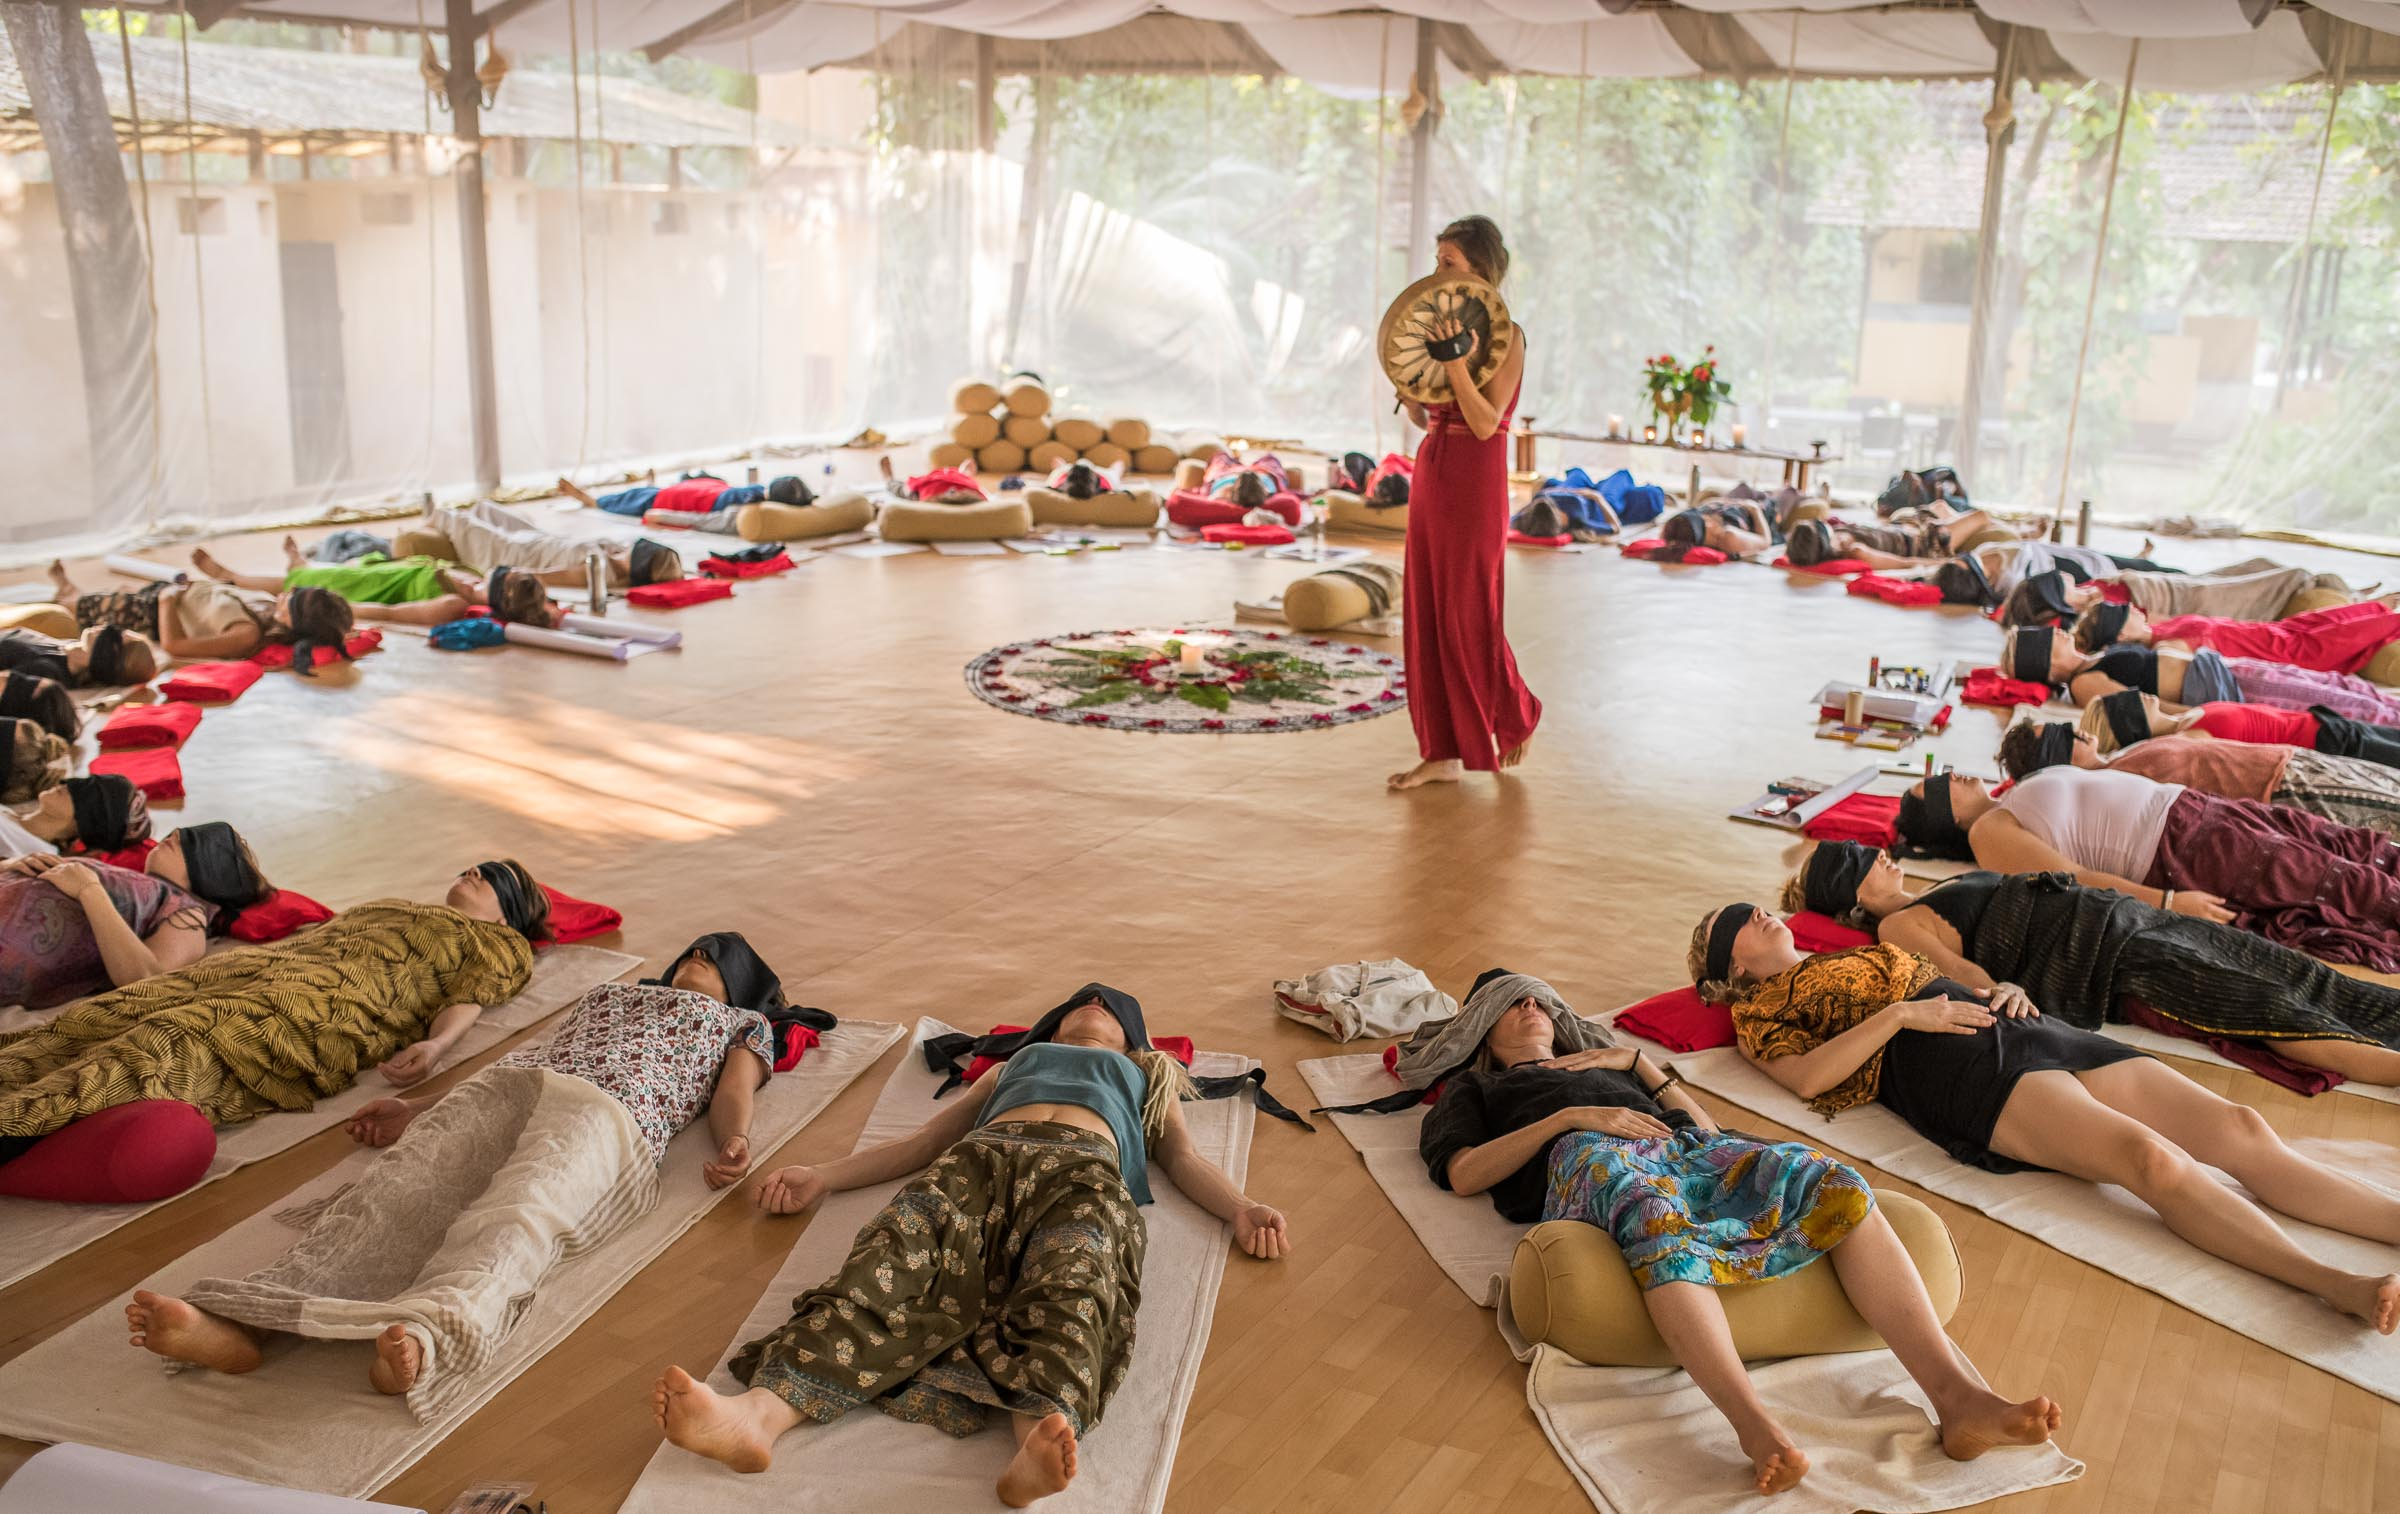 Wild Women drum workshop in India captured by Event photographer Magdalena Smolarska